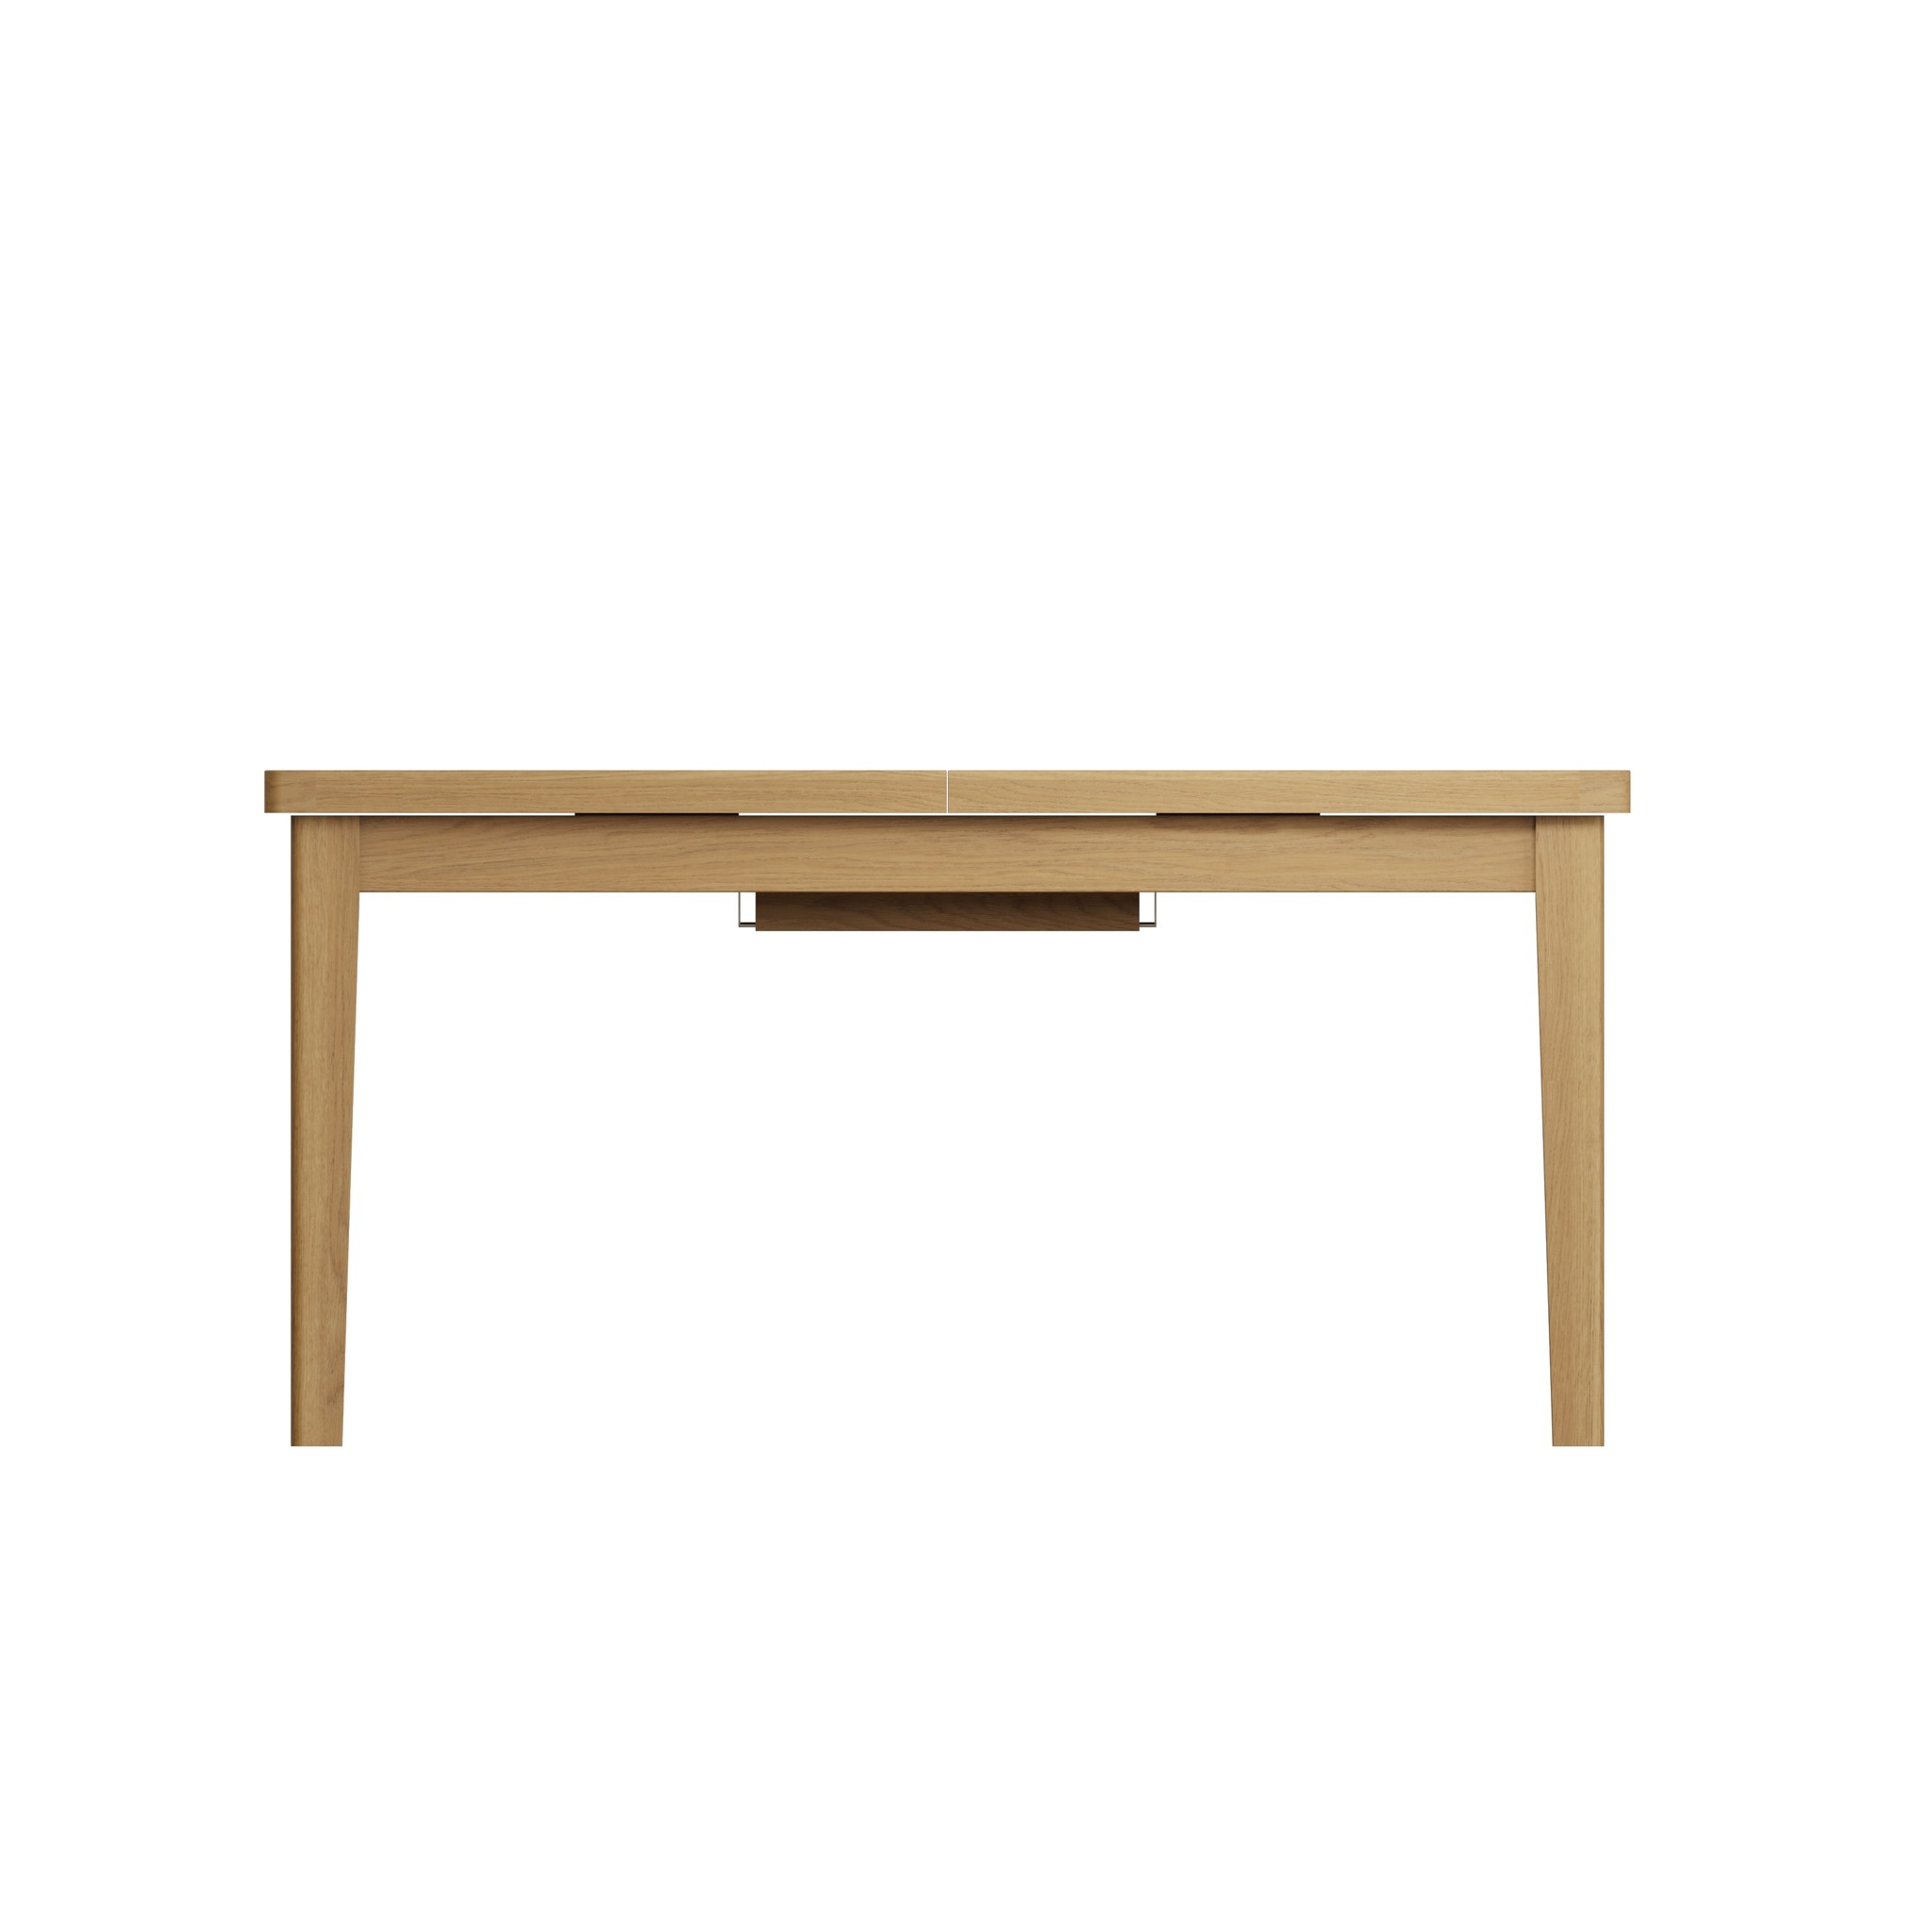 Essentials Rustic Oak 1.6M Extending Dining Table